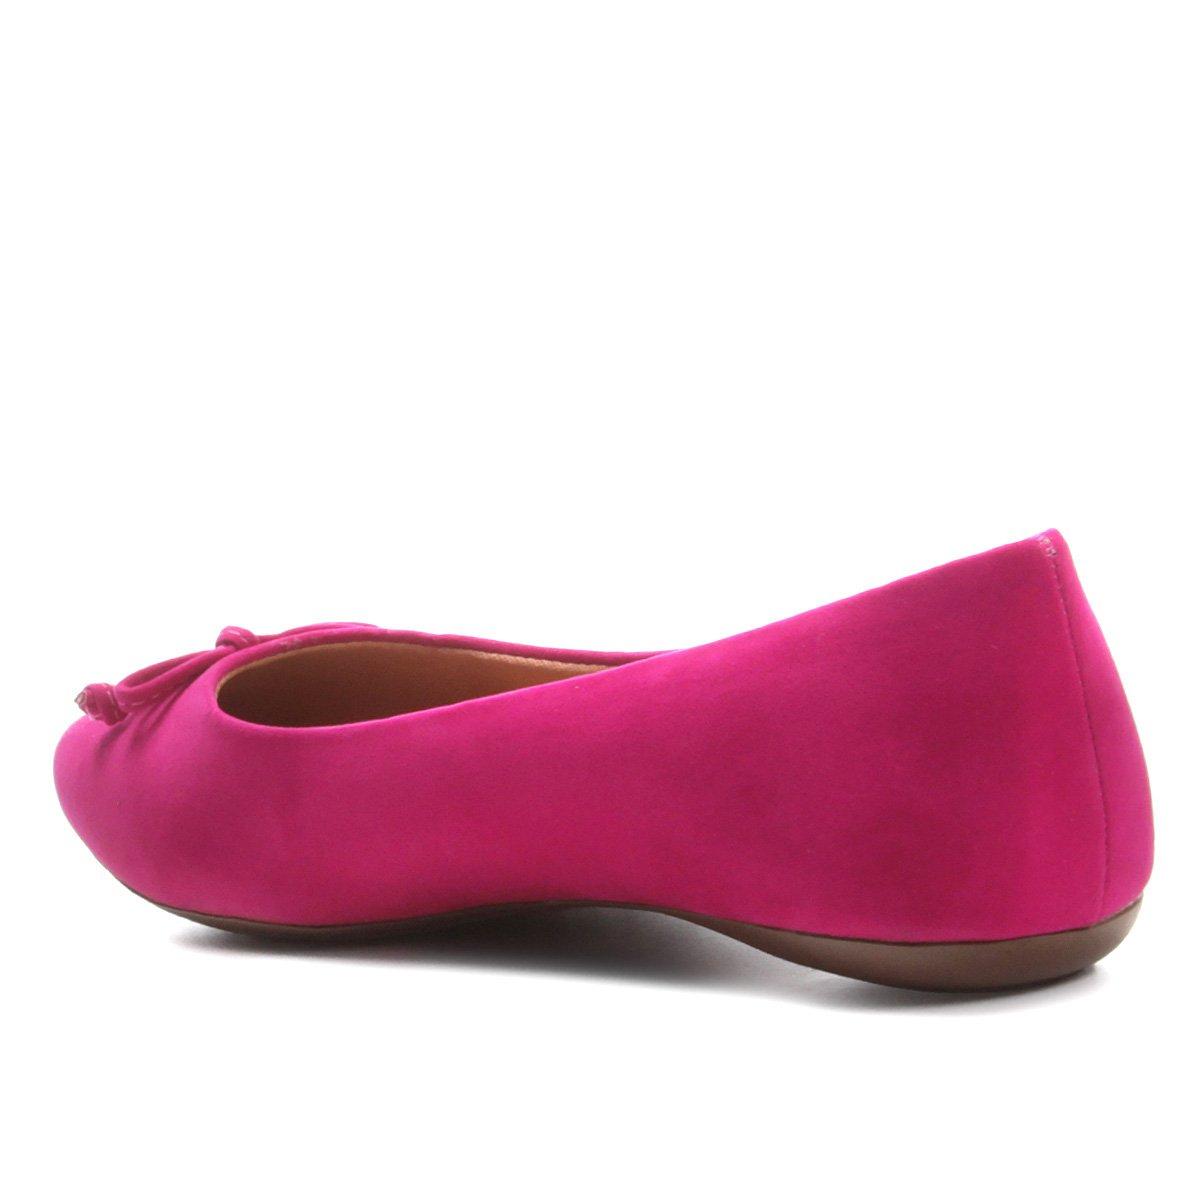 Sapatilha Feminina Pink Via Via Bico Sapatilha Sapatilha Uno Uno Bico Feminina Pink Quadrado Quadrado qprRAqS